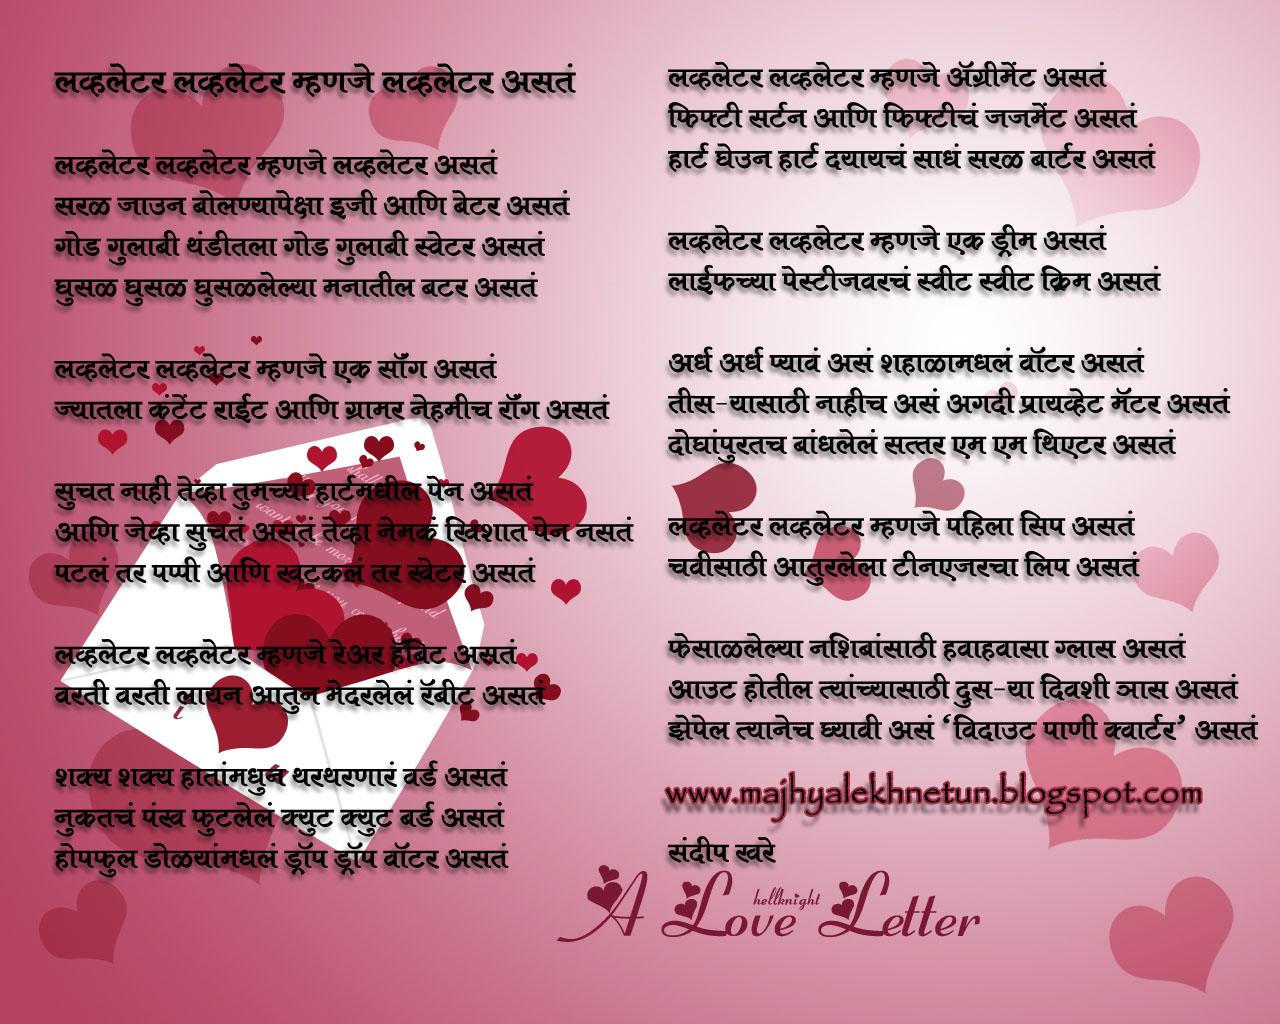 Love letter for her in marathi love letter marathi girlfriend spiritdancerdesigns Images